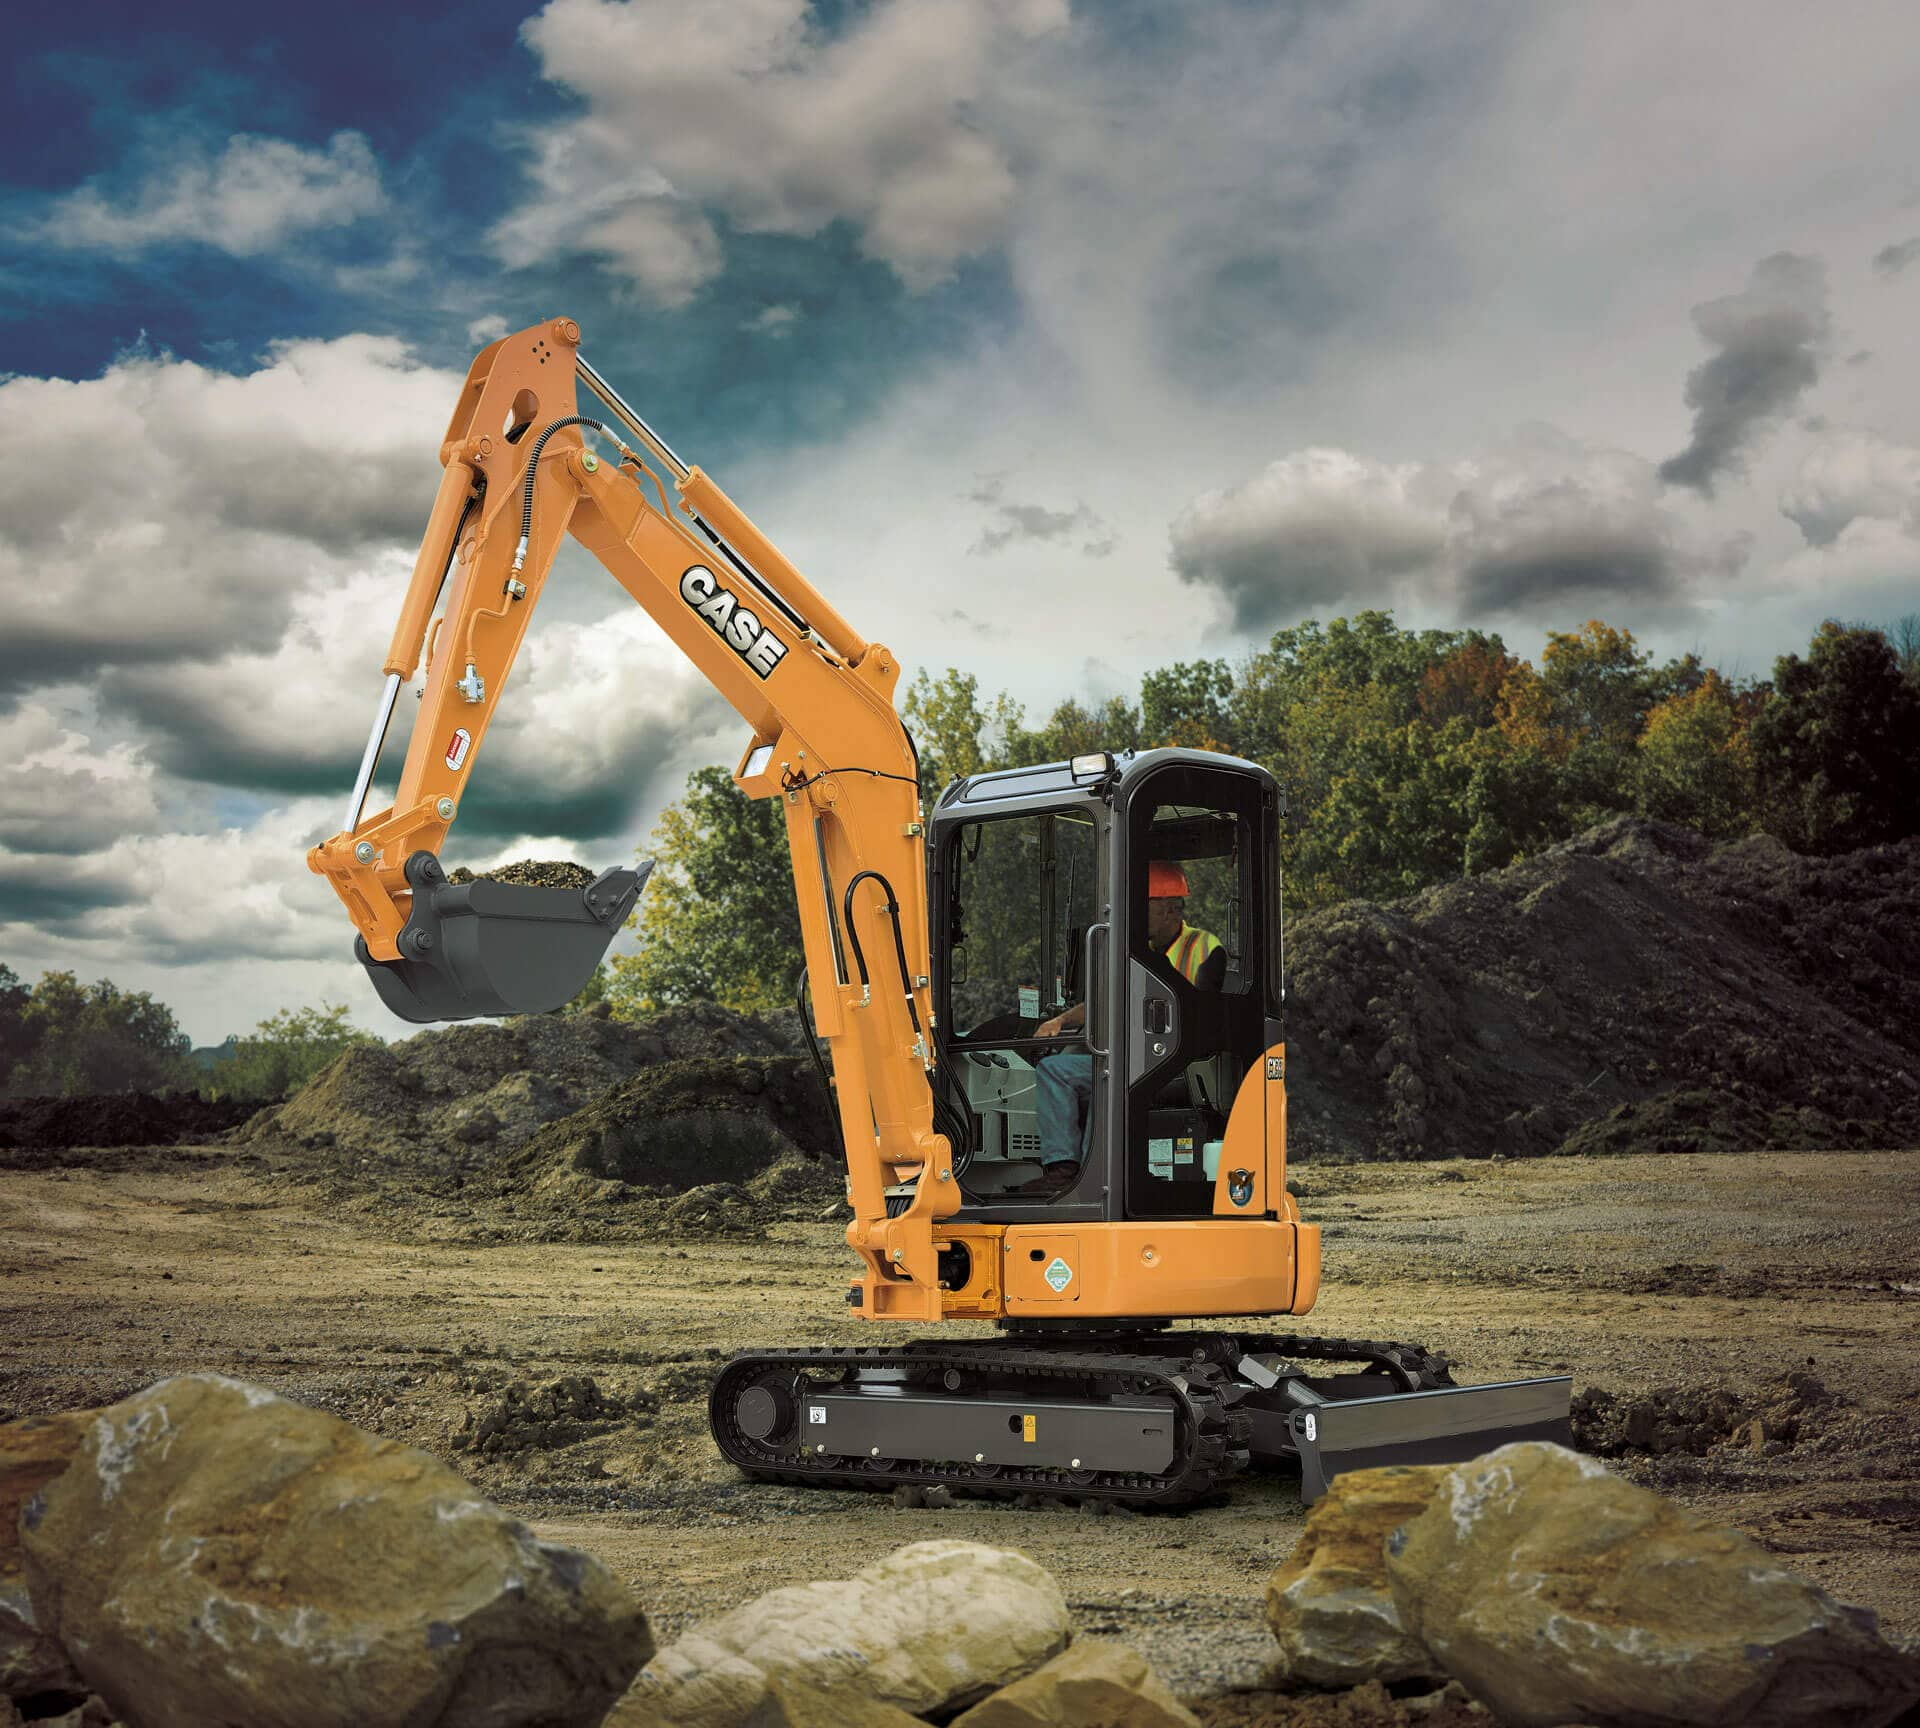 Case Cx36b Mini Excavator Construction Equipment Wiring Diagrams Gallery